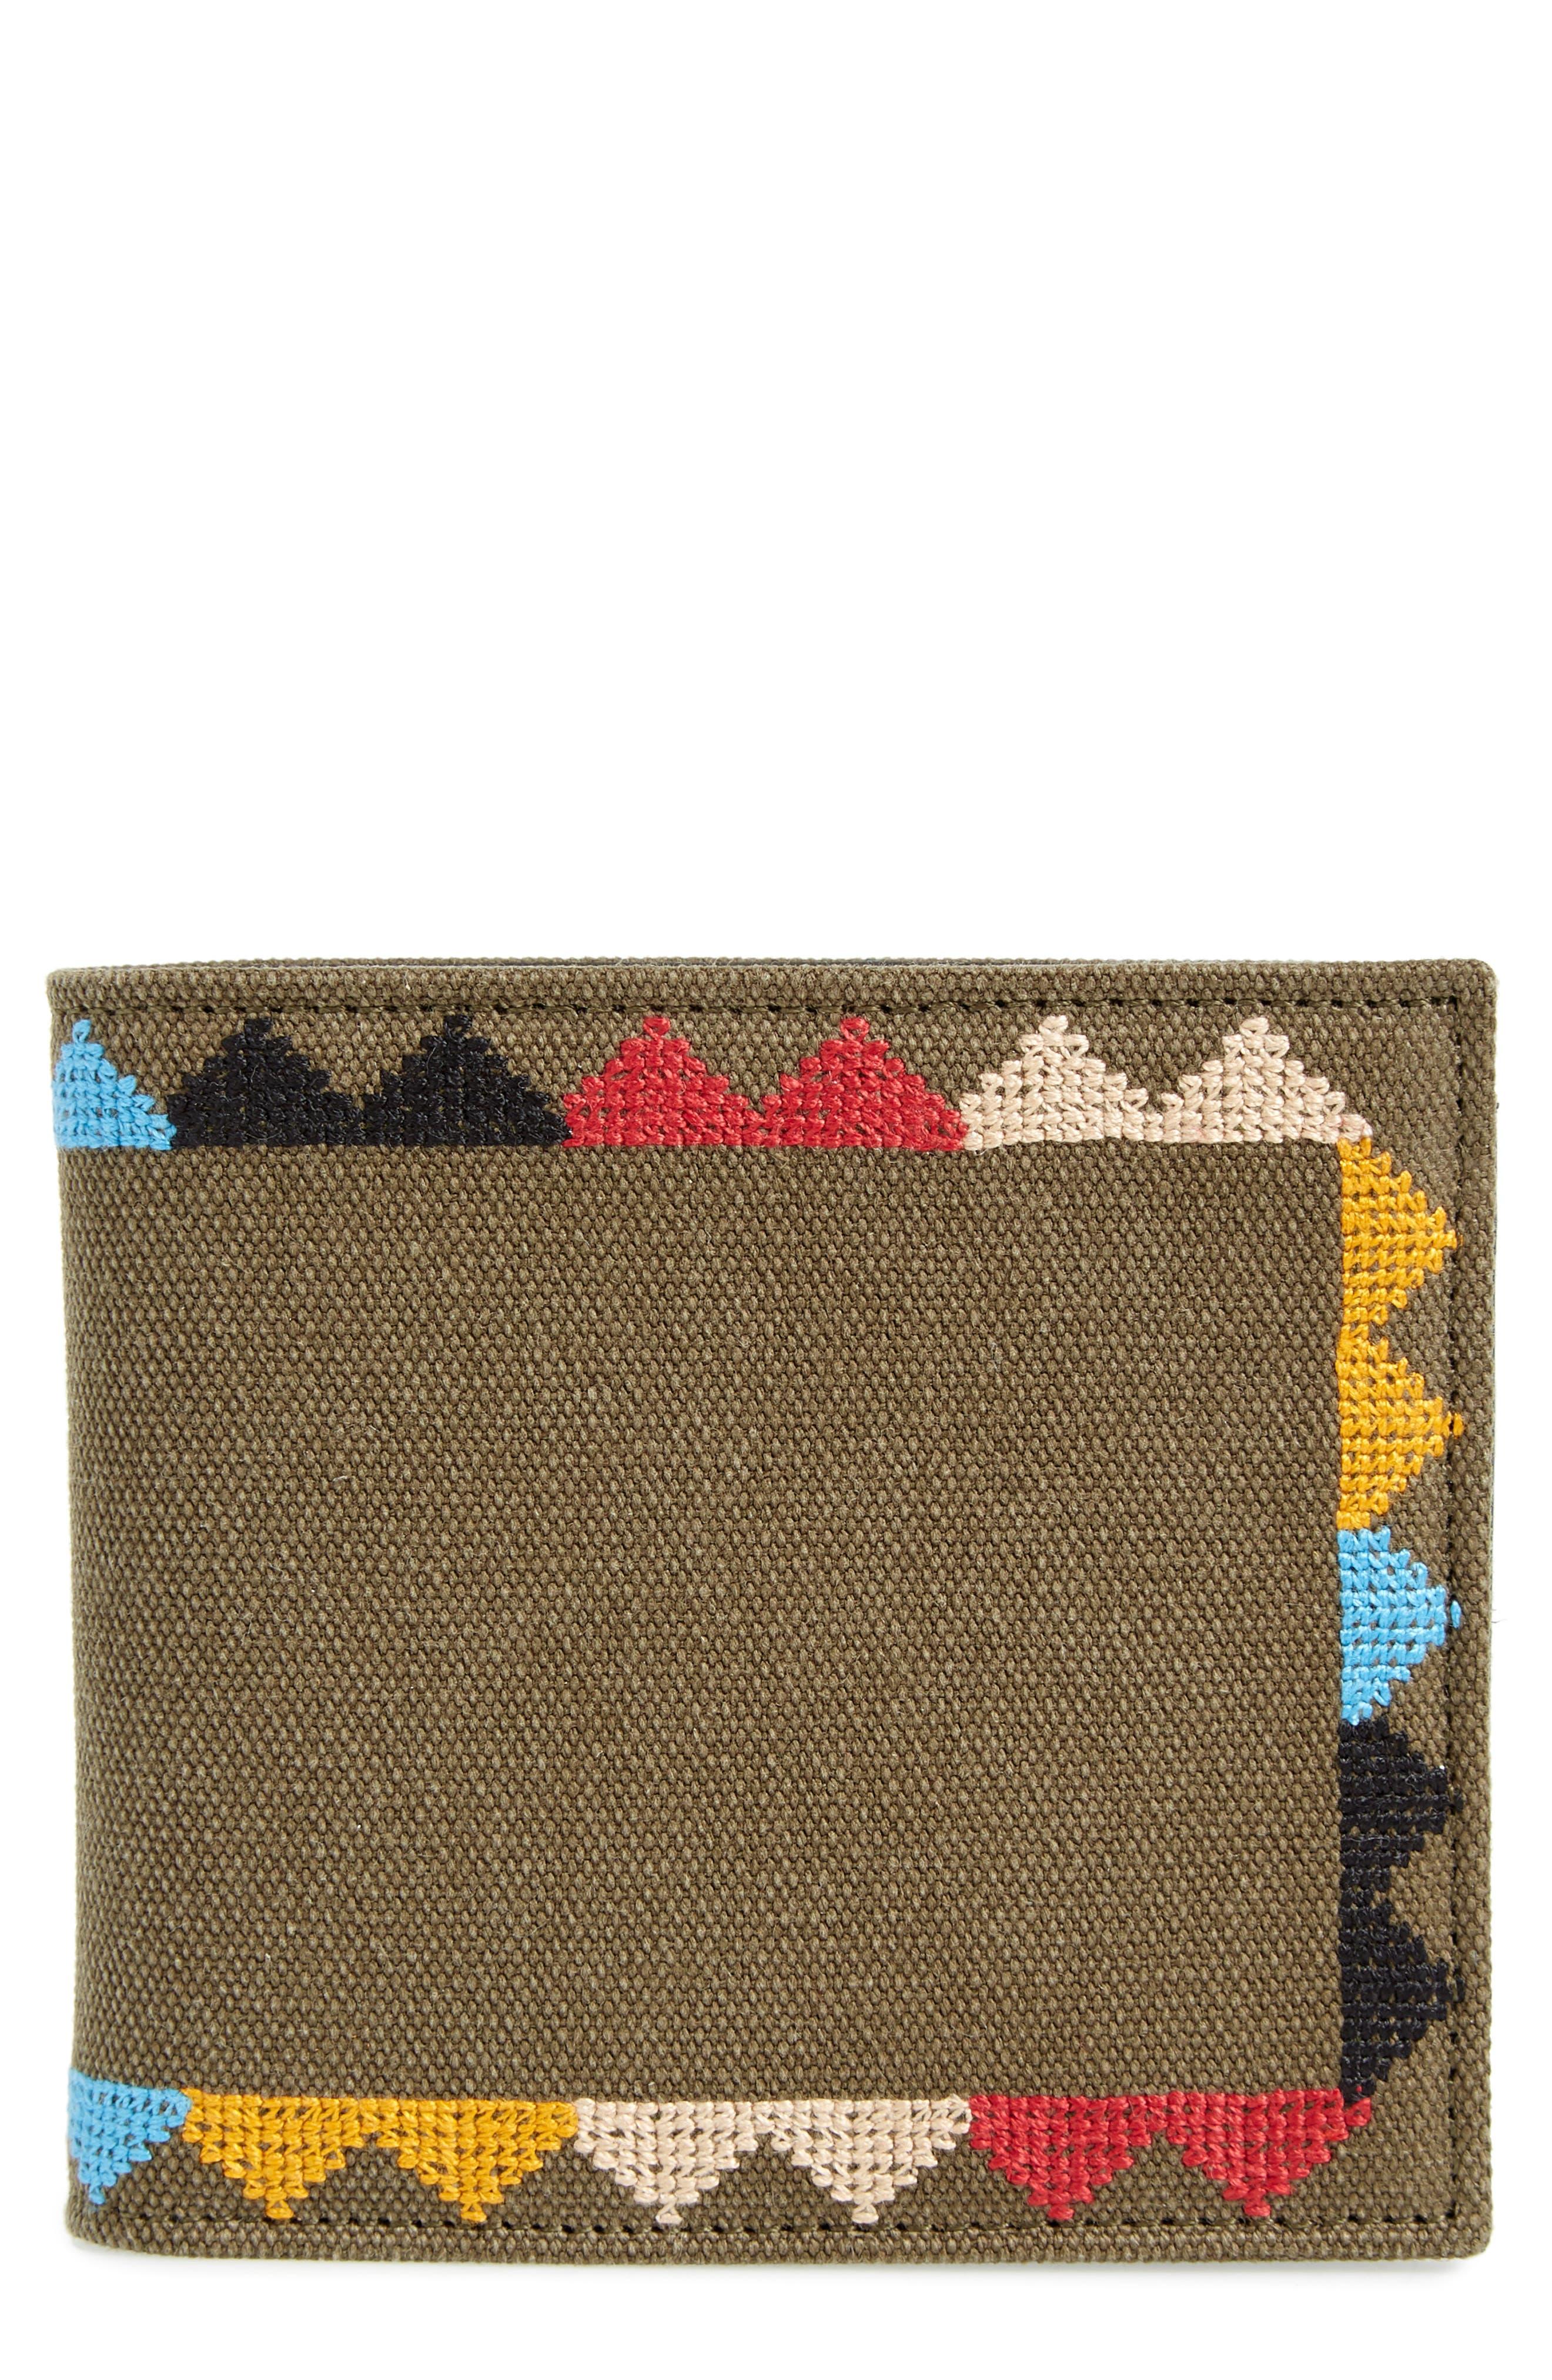 GARAVANI Canvas Wallet,                             Main thumbnail 1, color,                             370